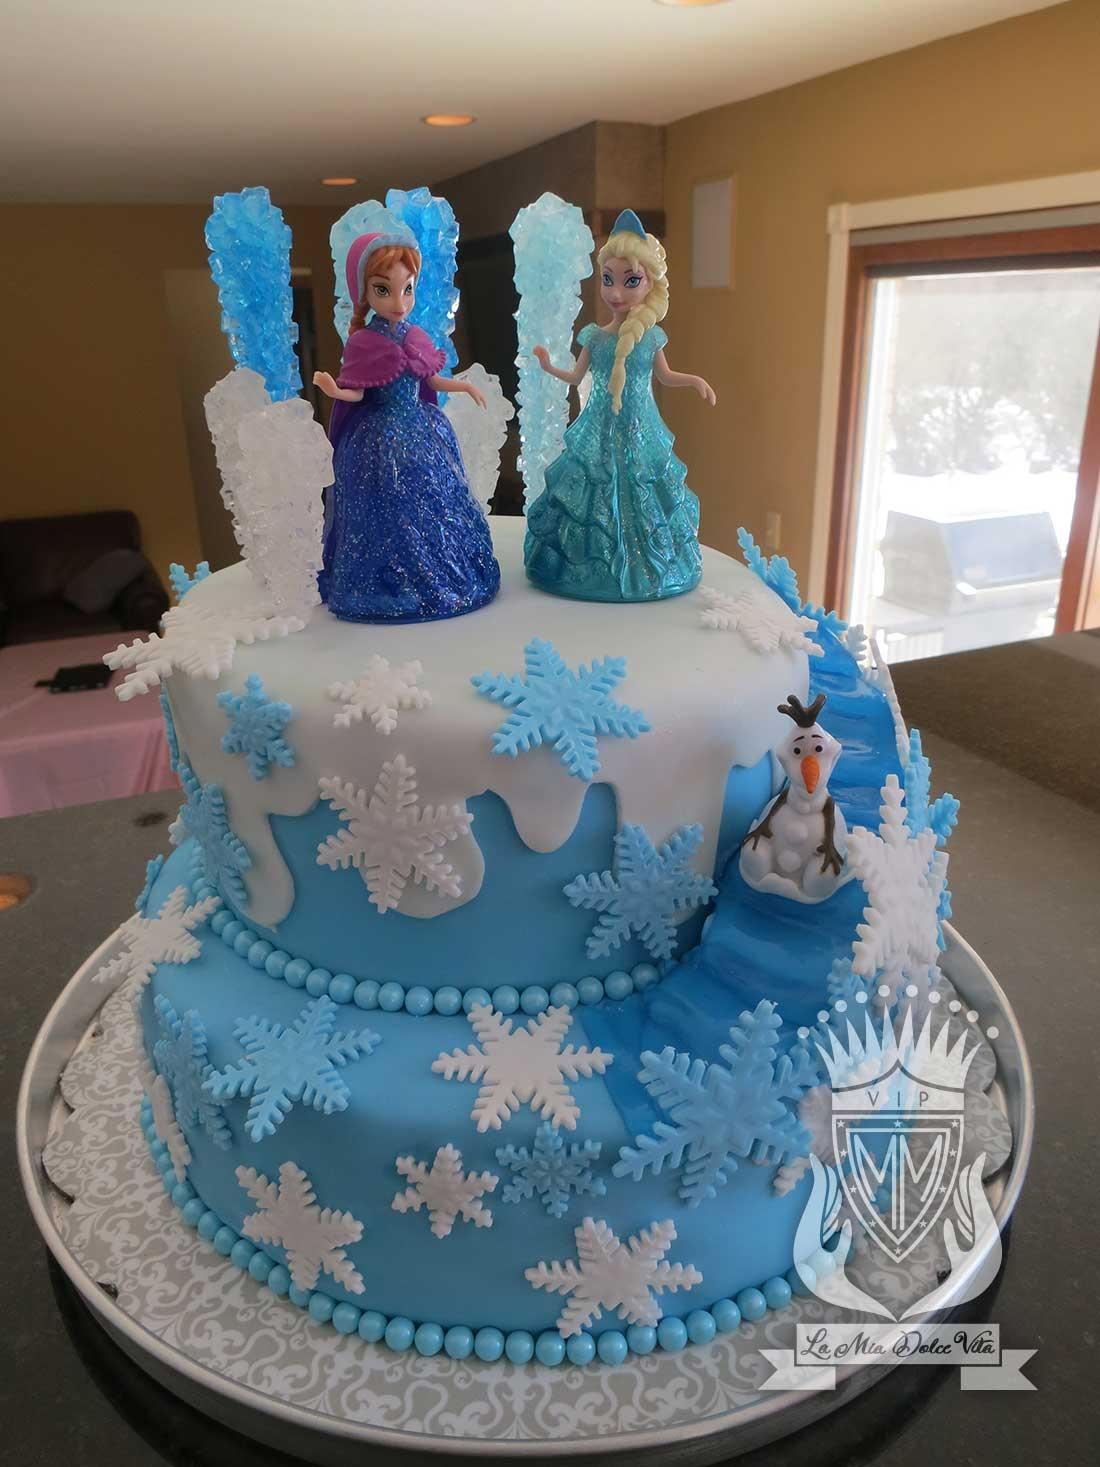 Tremendous Vip La Mia Dolce Vita Cake Art Frozen Birthday Cake Funny Birthday Cards Online Alyptdamsfinfo